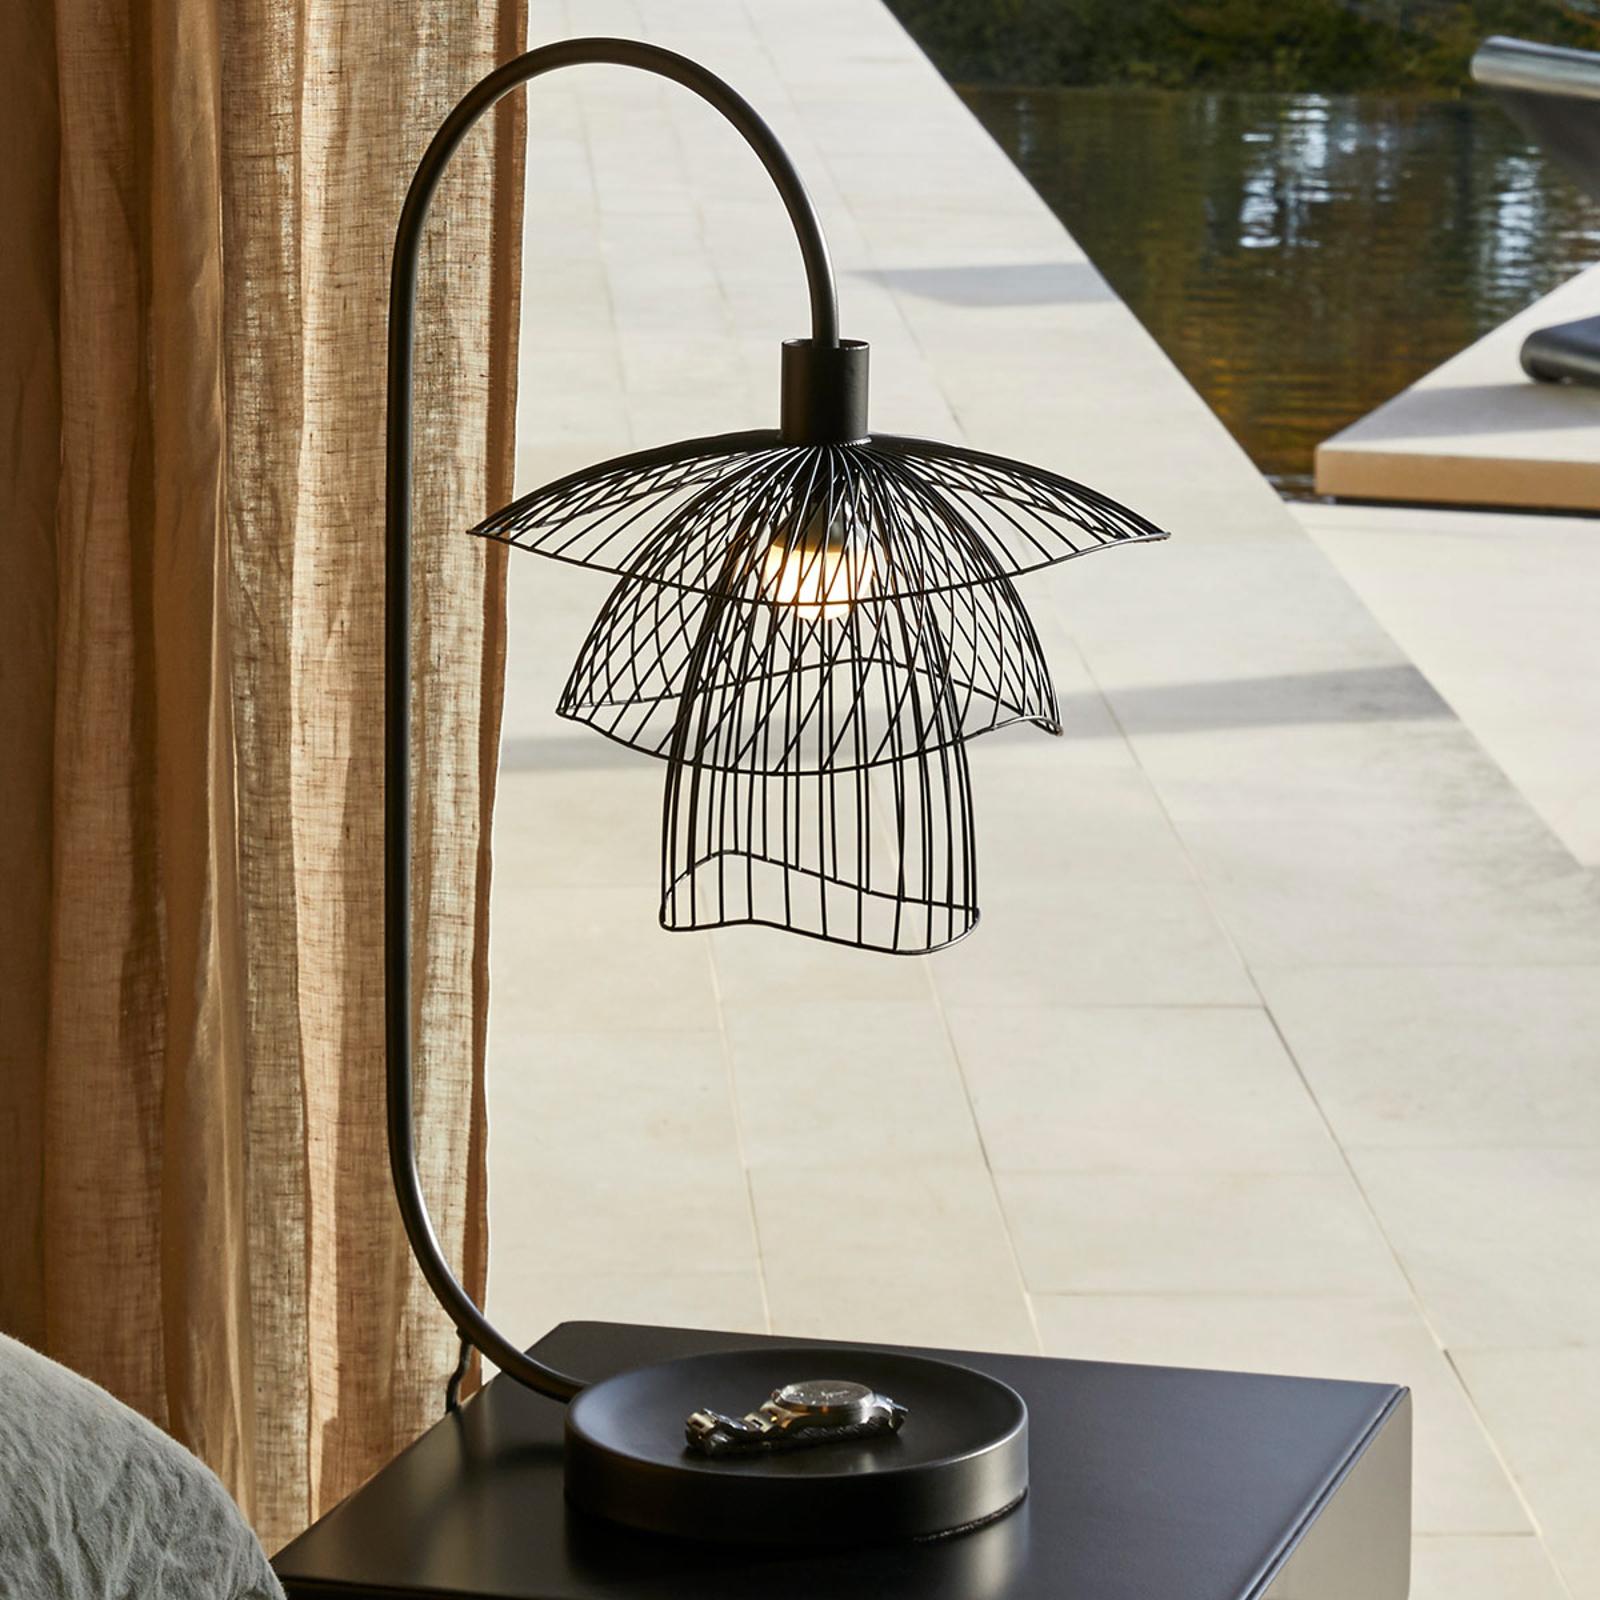 Forestier Papillon XS designer tafellamp